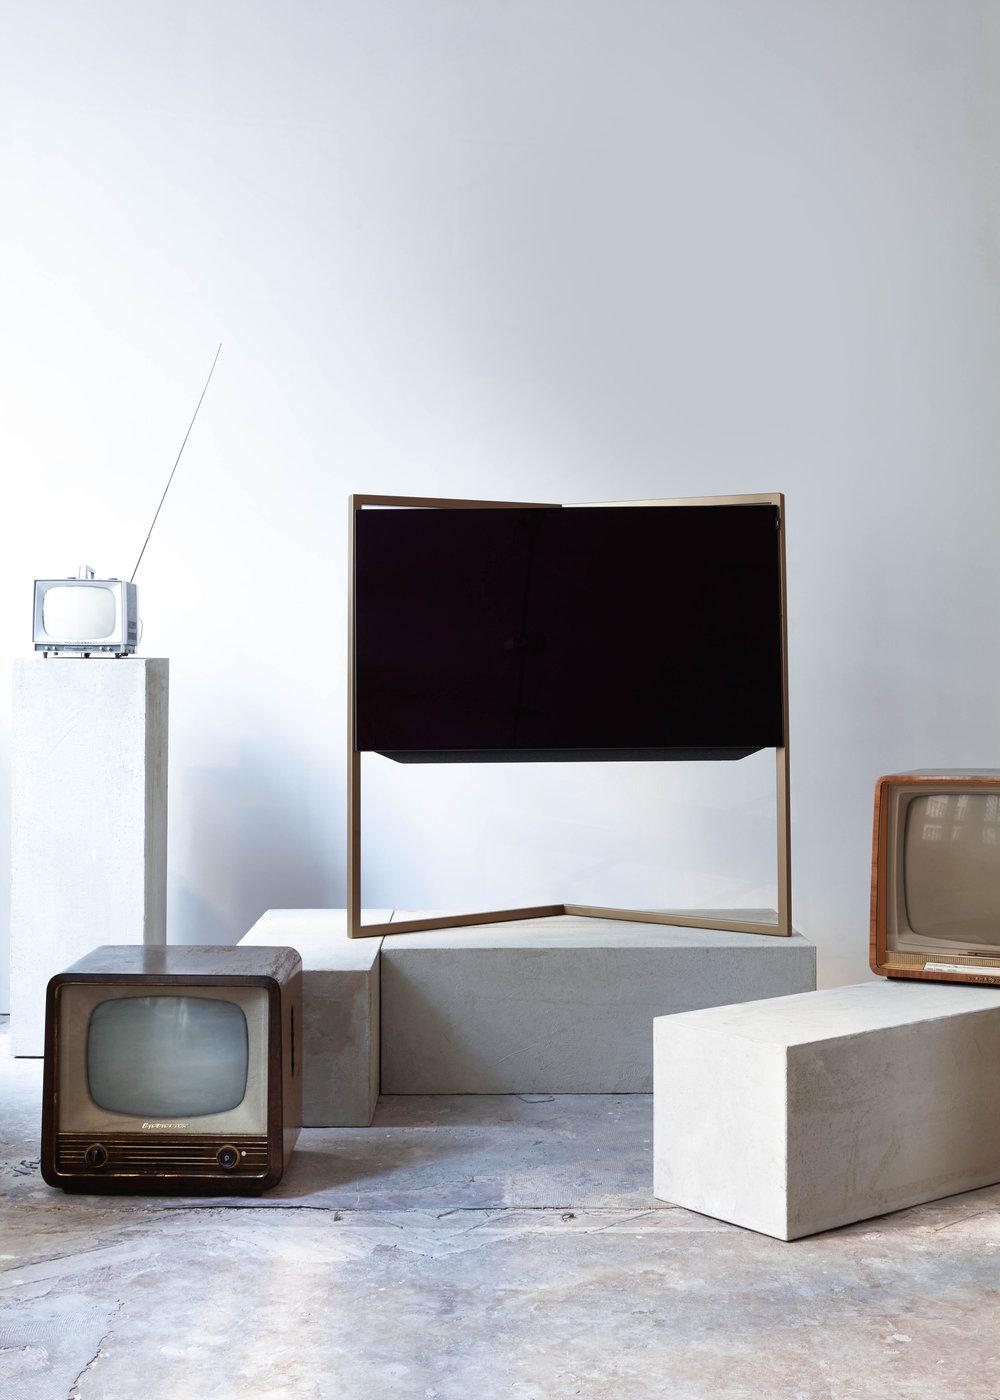 Nowe spojrzenie na telewizor Loewe